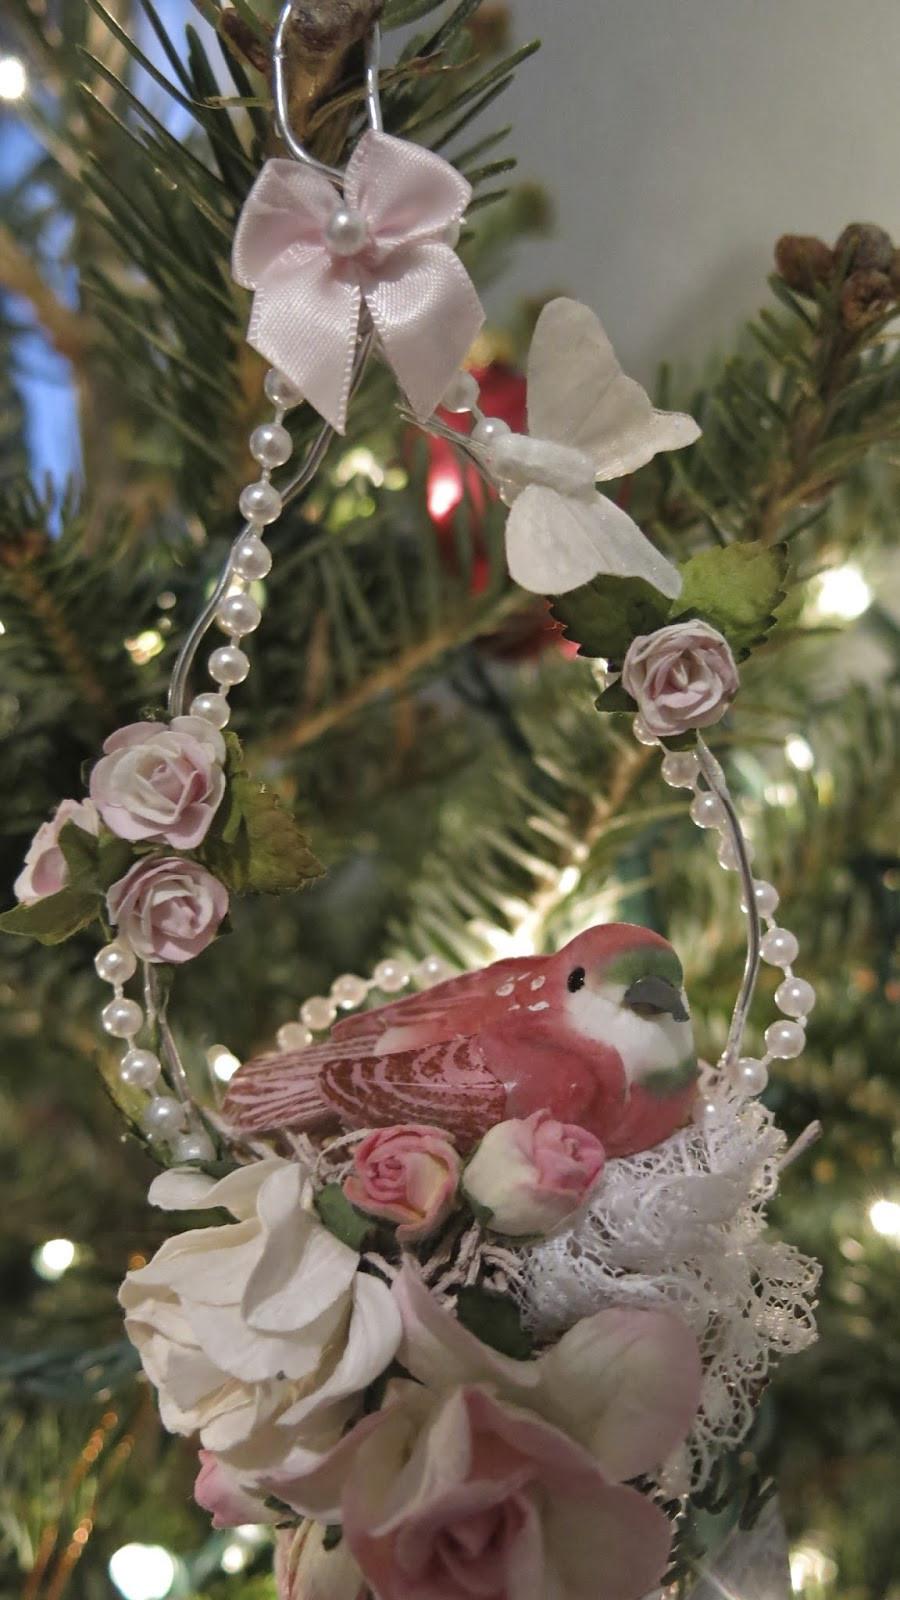 Shabby Chic Christmas Ornaments  Martica Designs Shabby Chic Christmas Spool Ornament